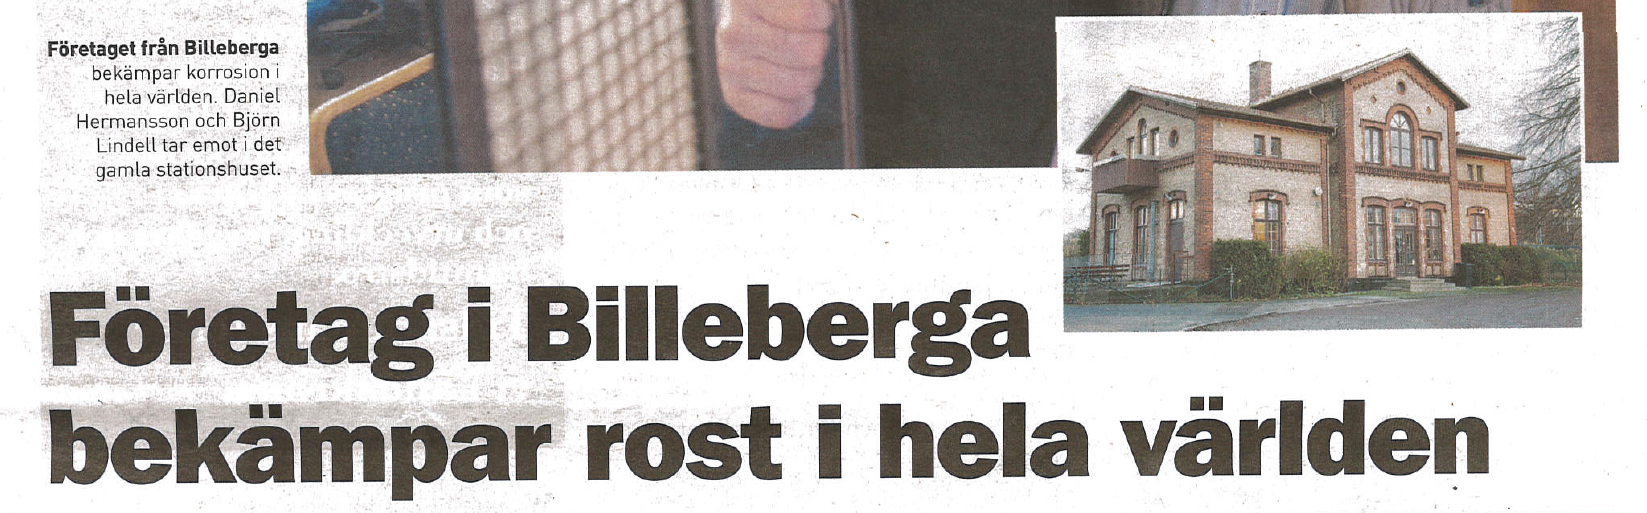 Vrm Billeberga karta - patient-survey.net